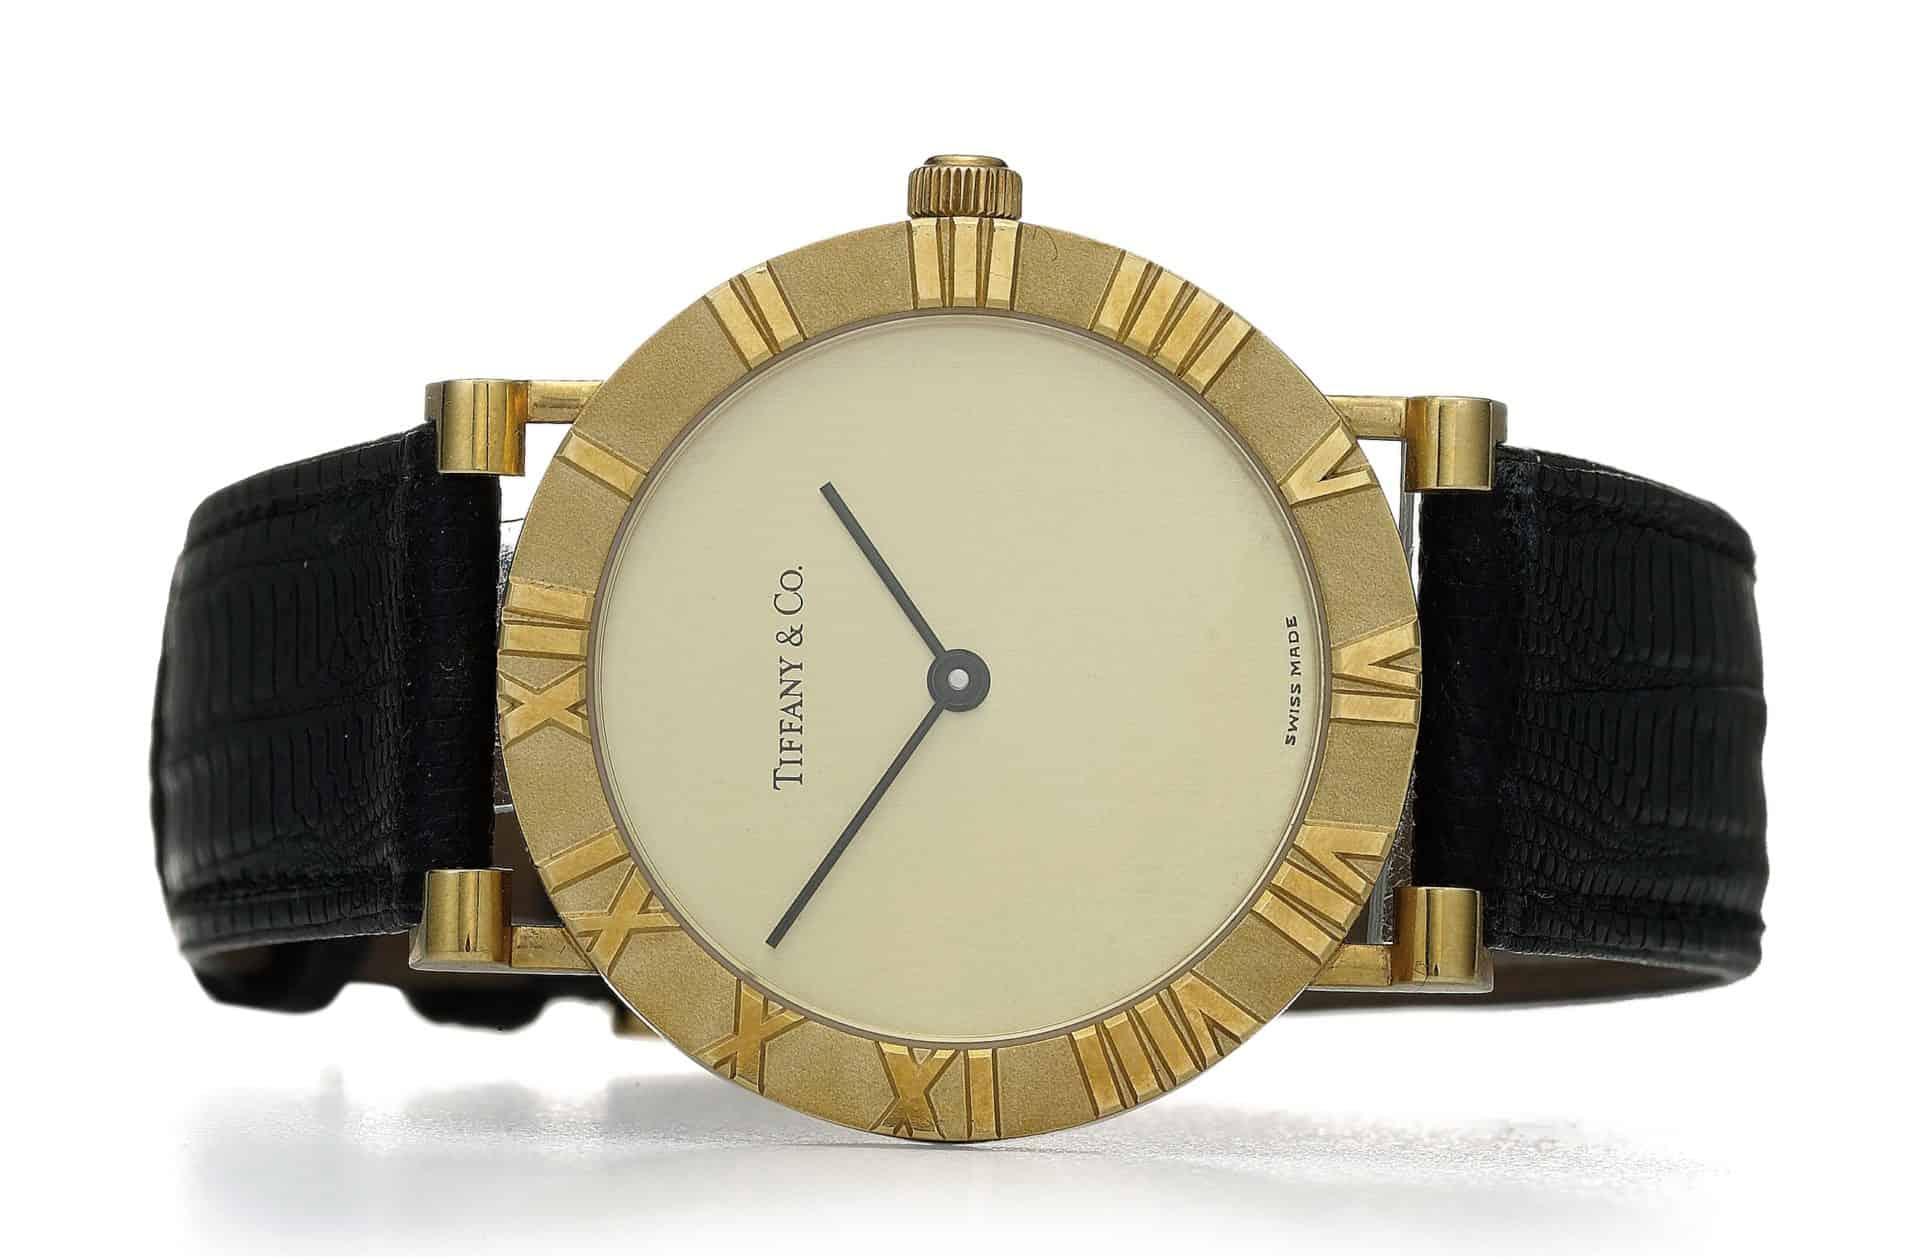 Tiffany Atlas Watch